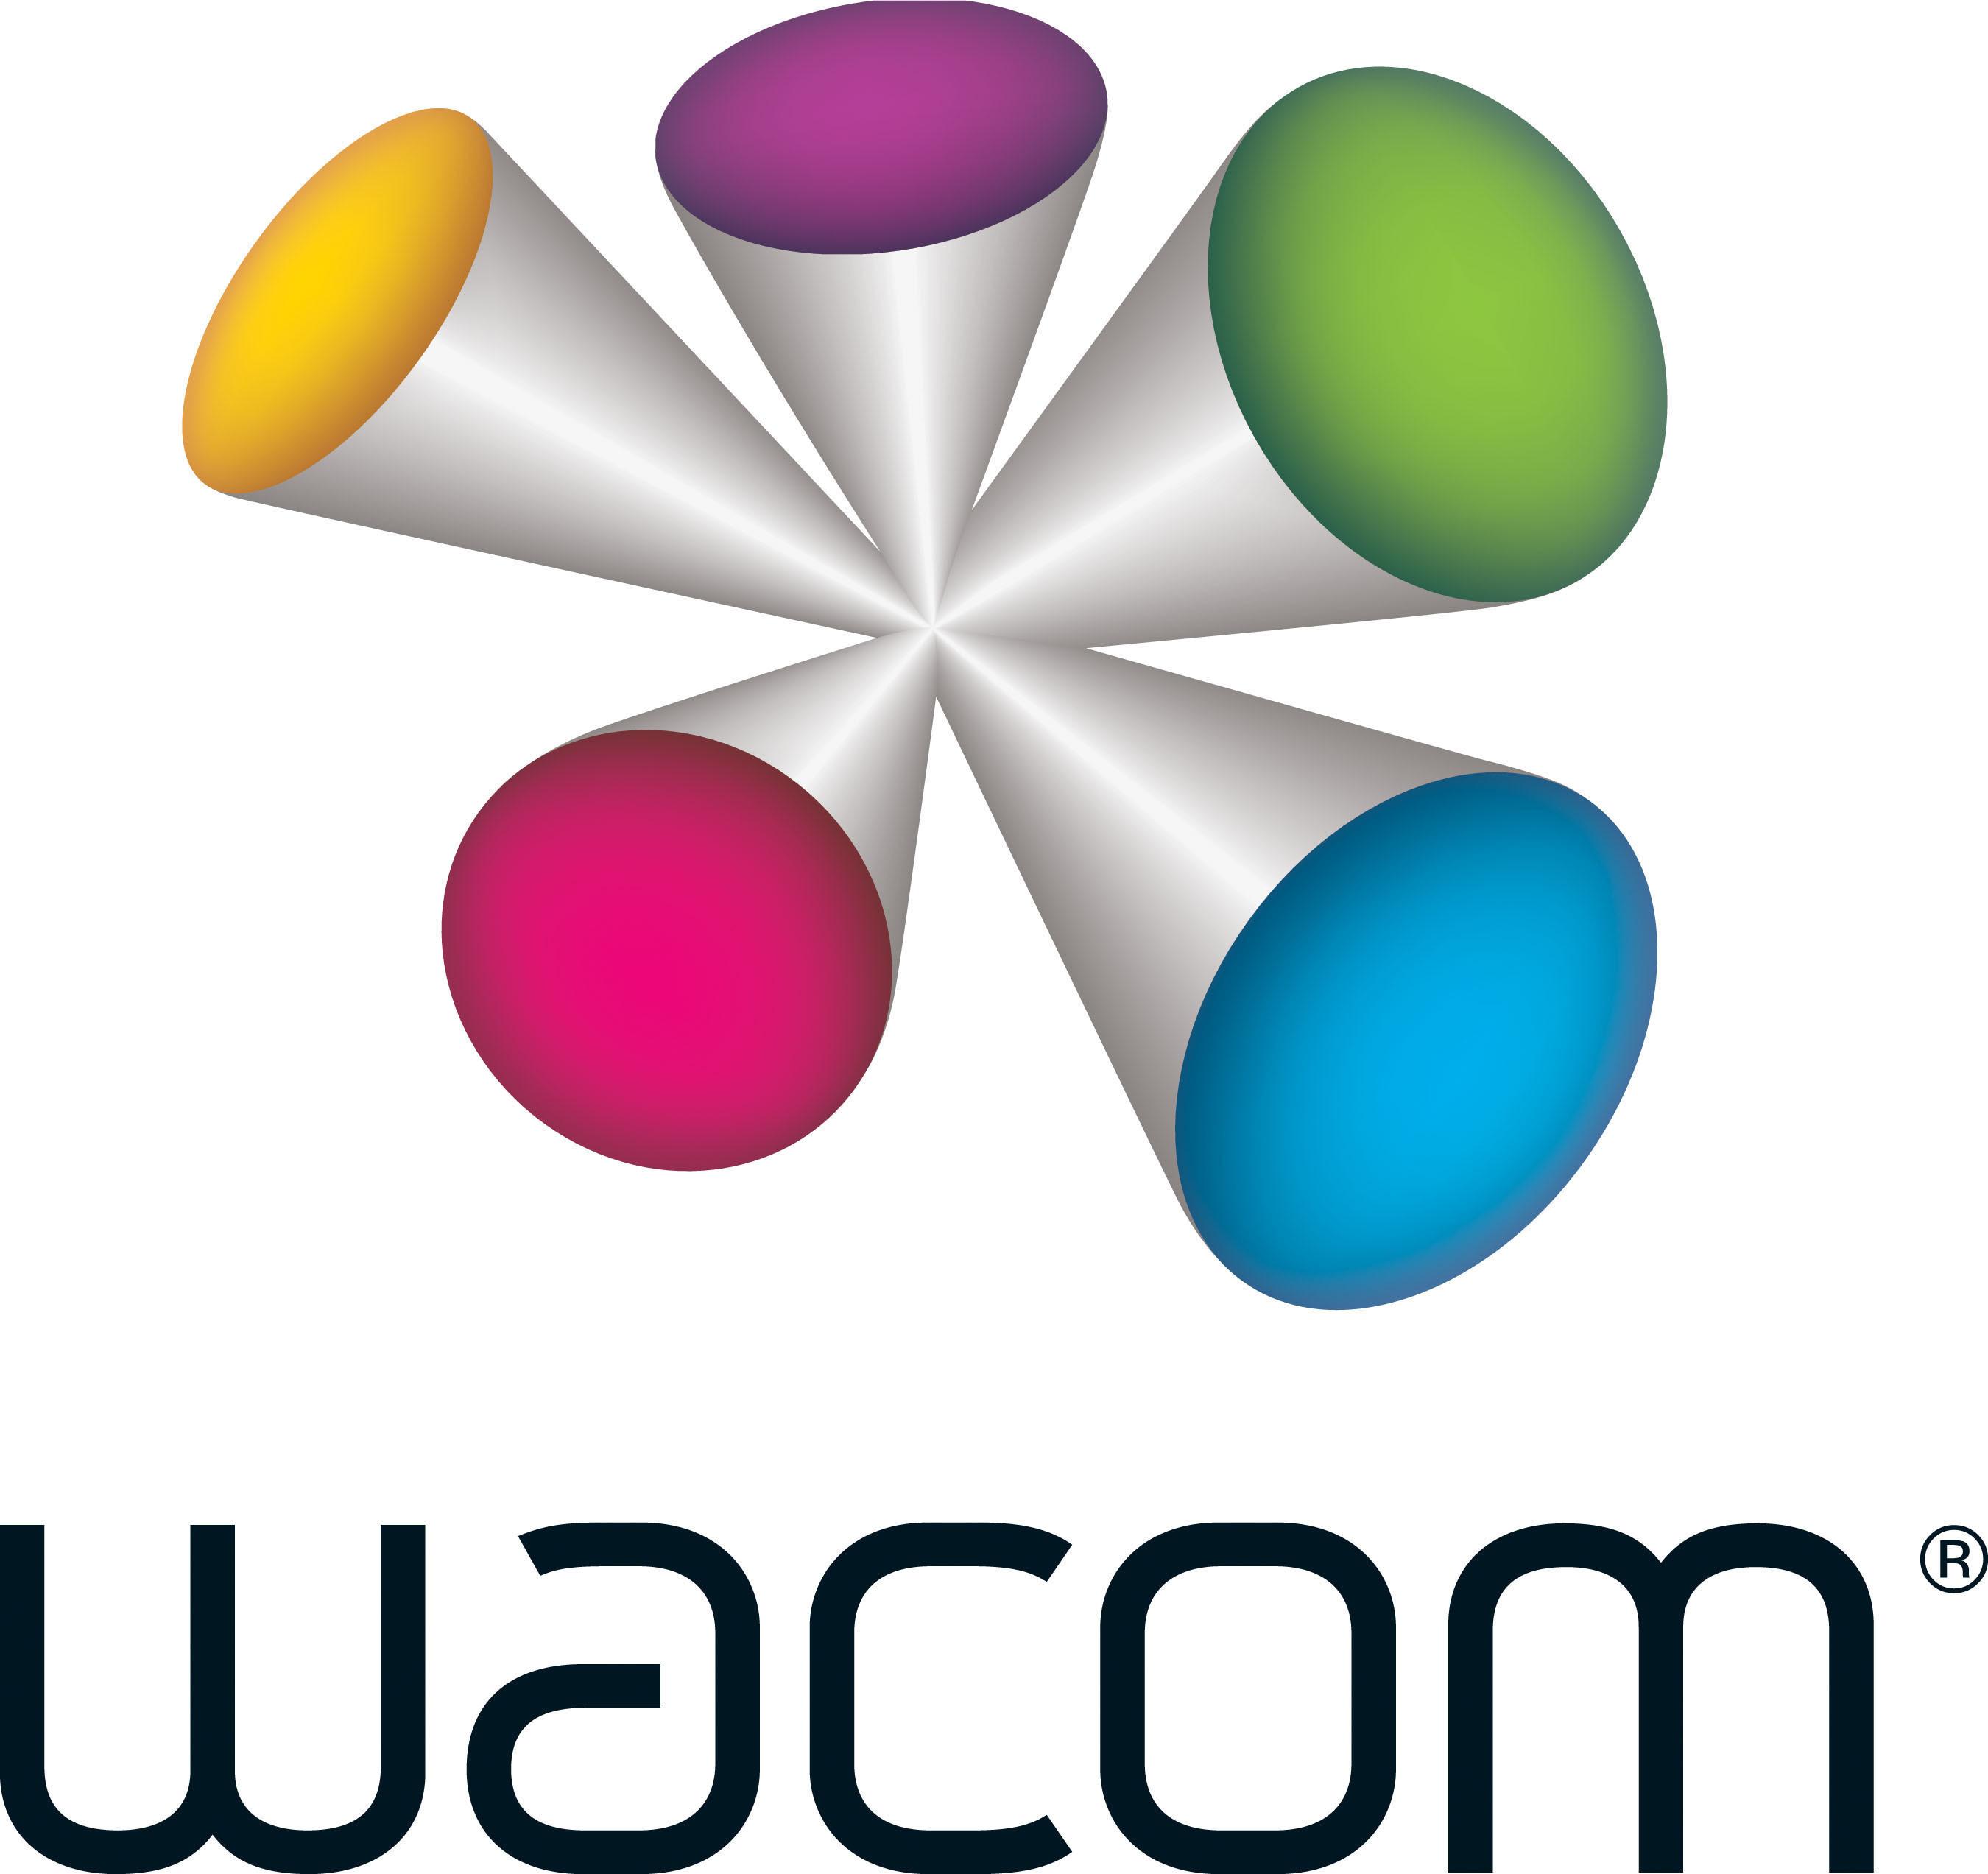 Wacom tablety. Wacom tablety Bamboo, Wacom tablety Intuos, Wacom tablety, Wacom tablety LCD, Wacom príslušenstvo a Wacom Wireless.